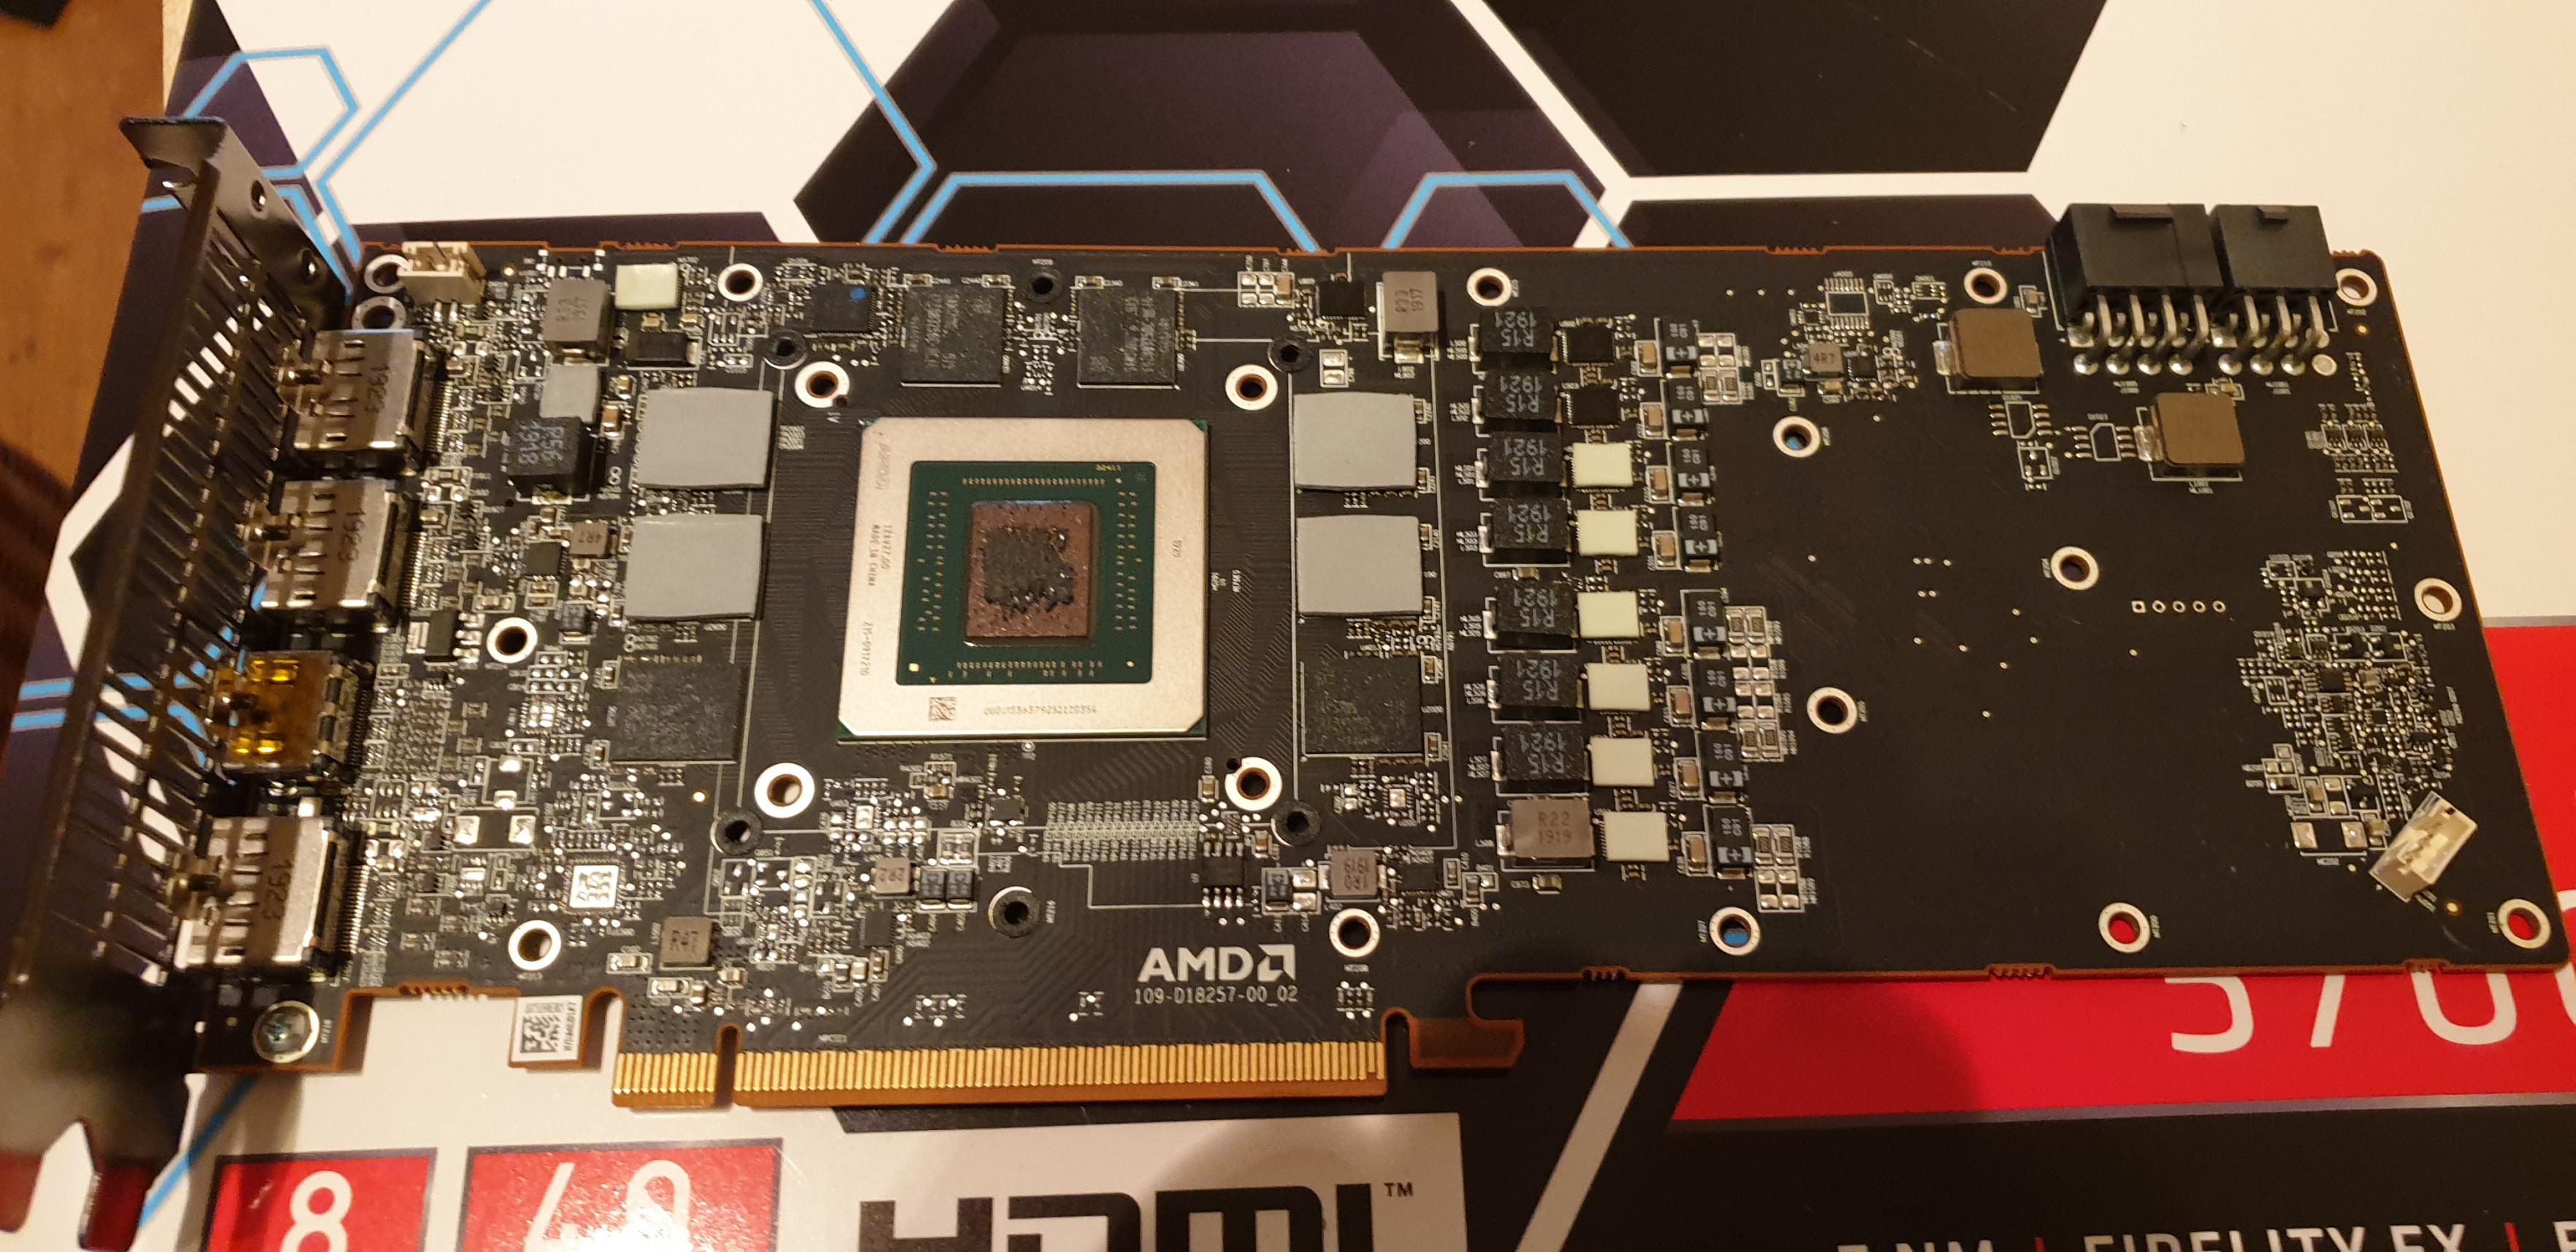 RX 5700 XT mit Accelero Xtreme IV*(Wärmeleitpads)?